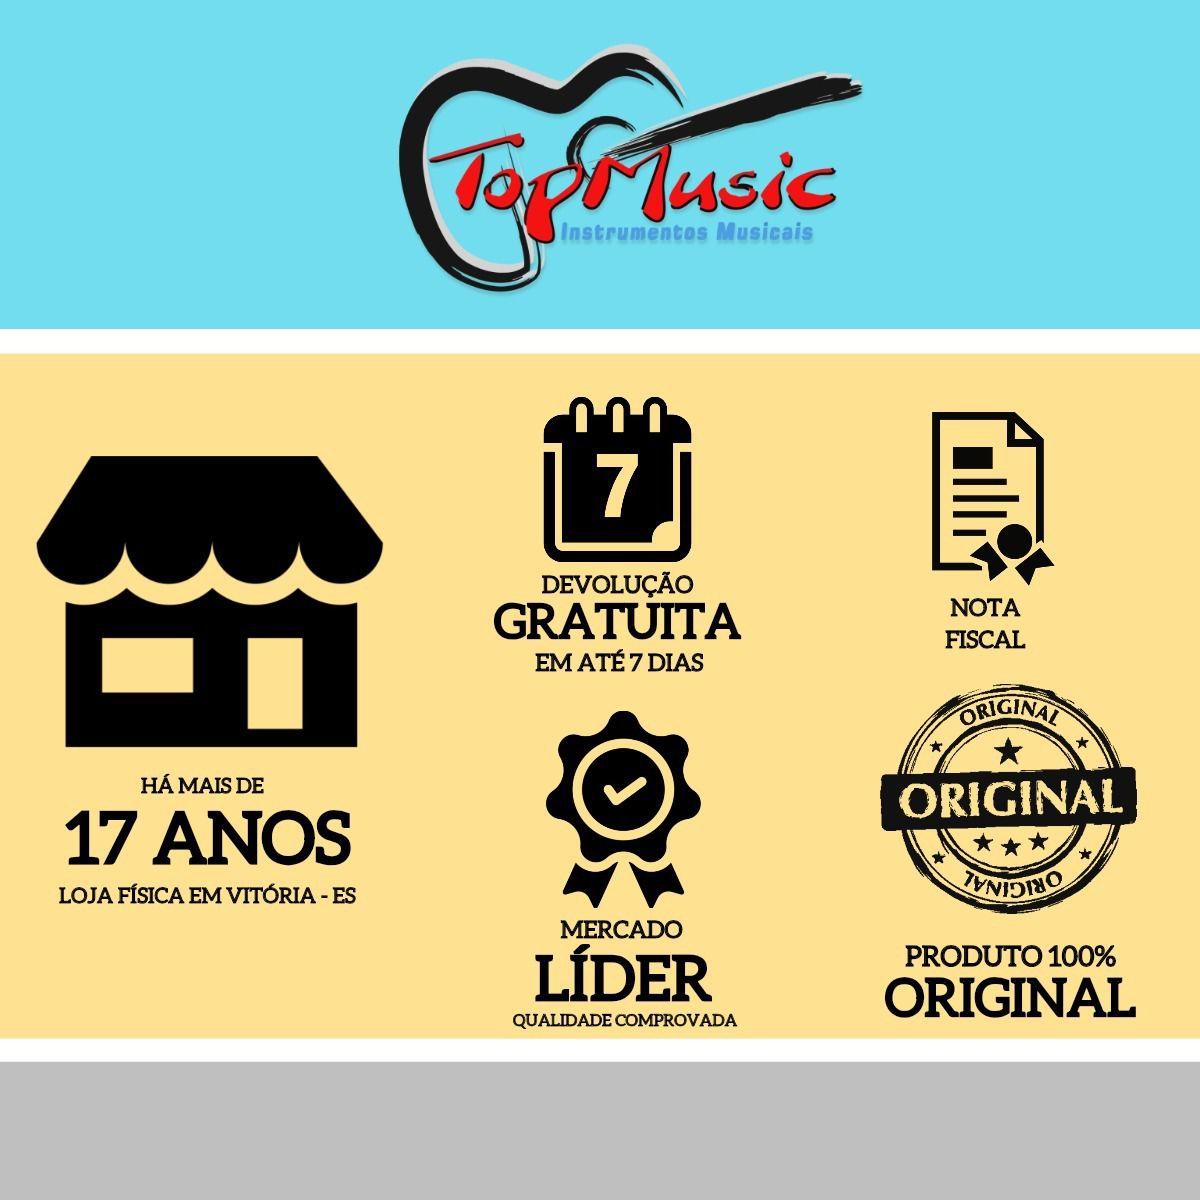 Violino Vivace Mozart Mo34 3/4 + Estojo Arco Breu